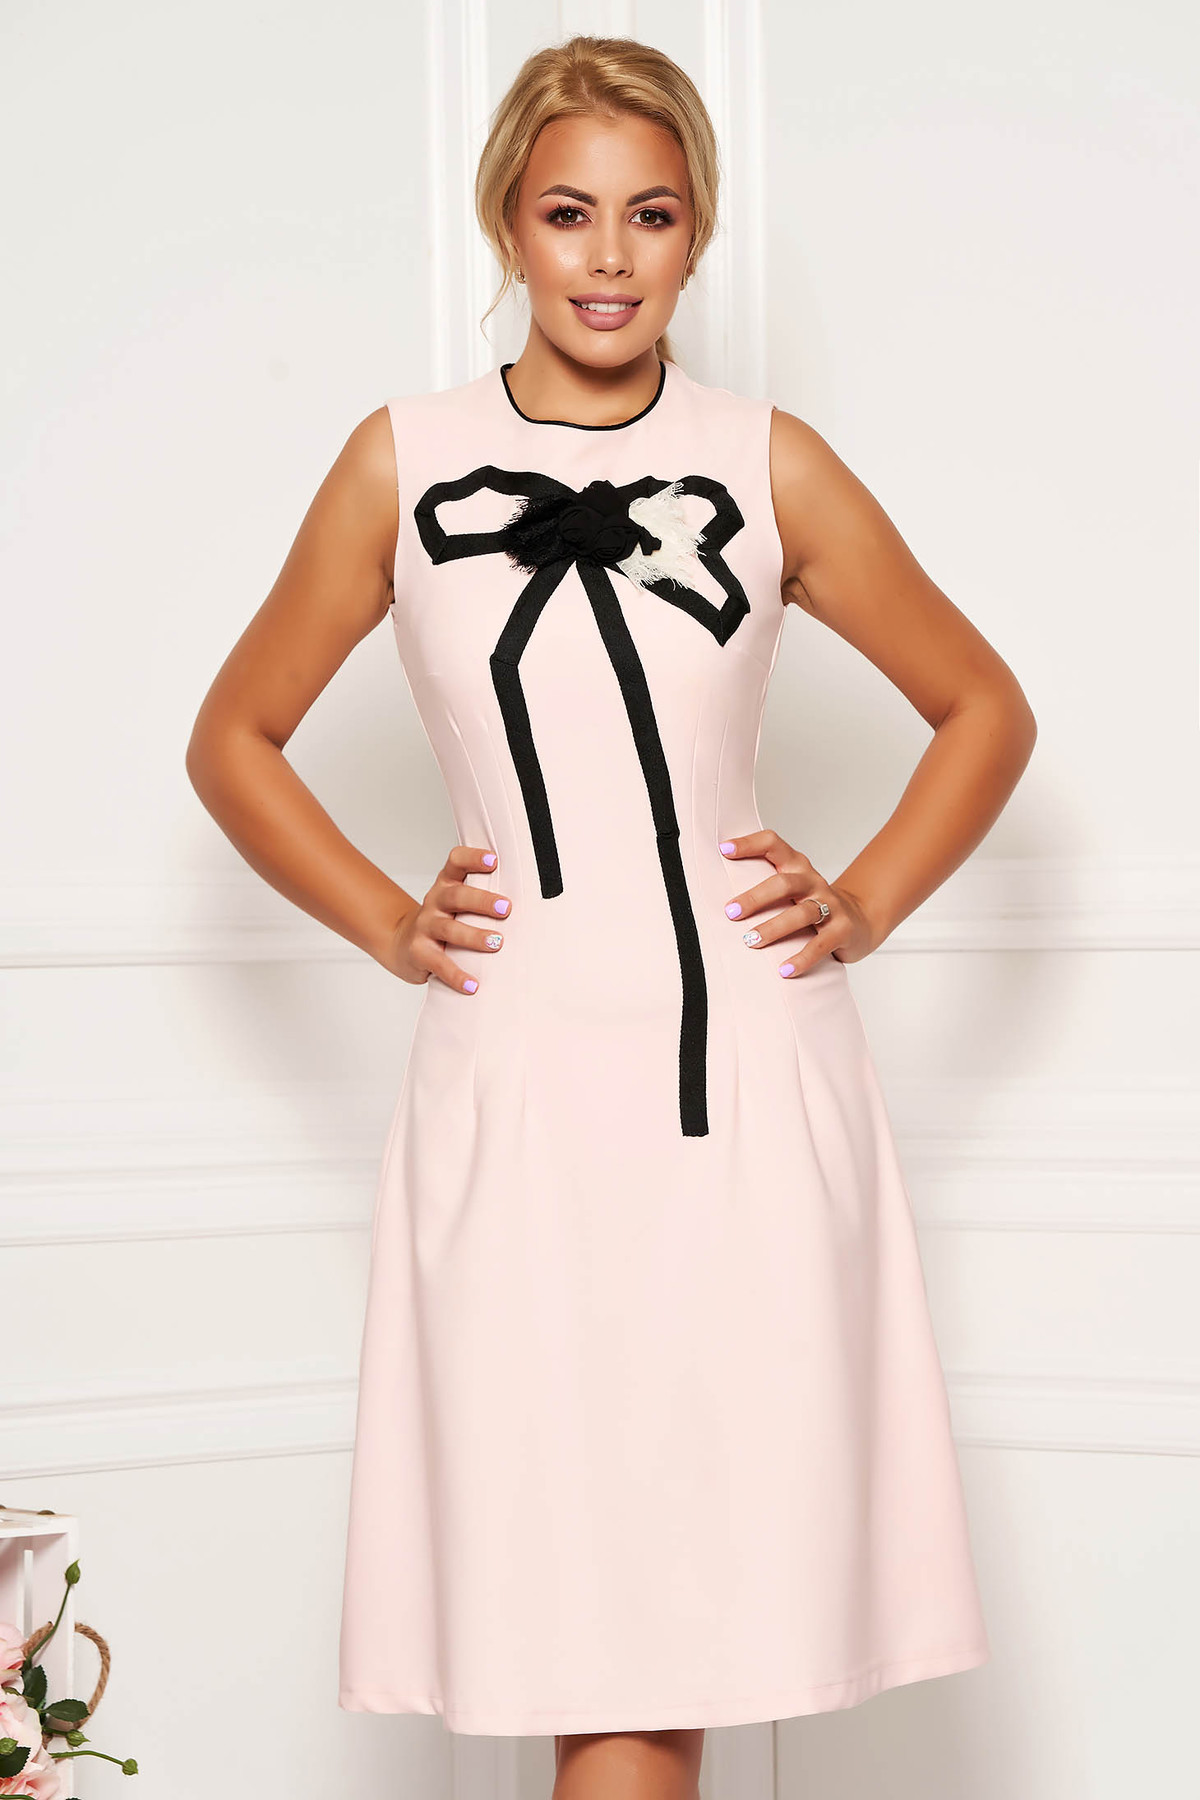 Rochie Artista roz deschis eleganta in clos din material usor elastic cu aplicatii cusute manual